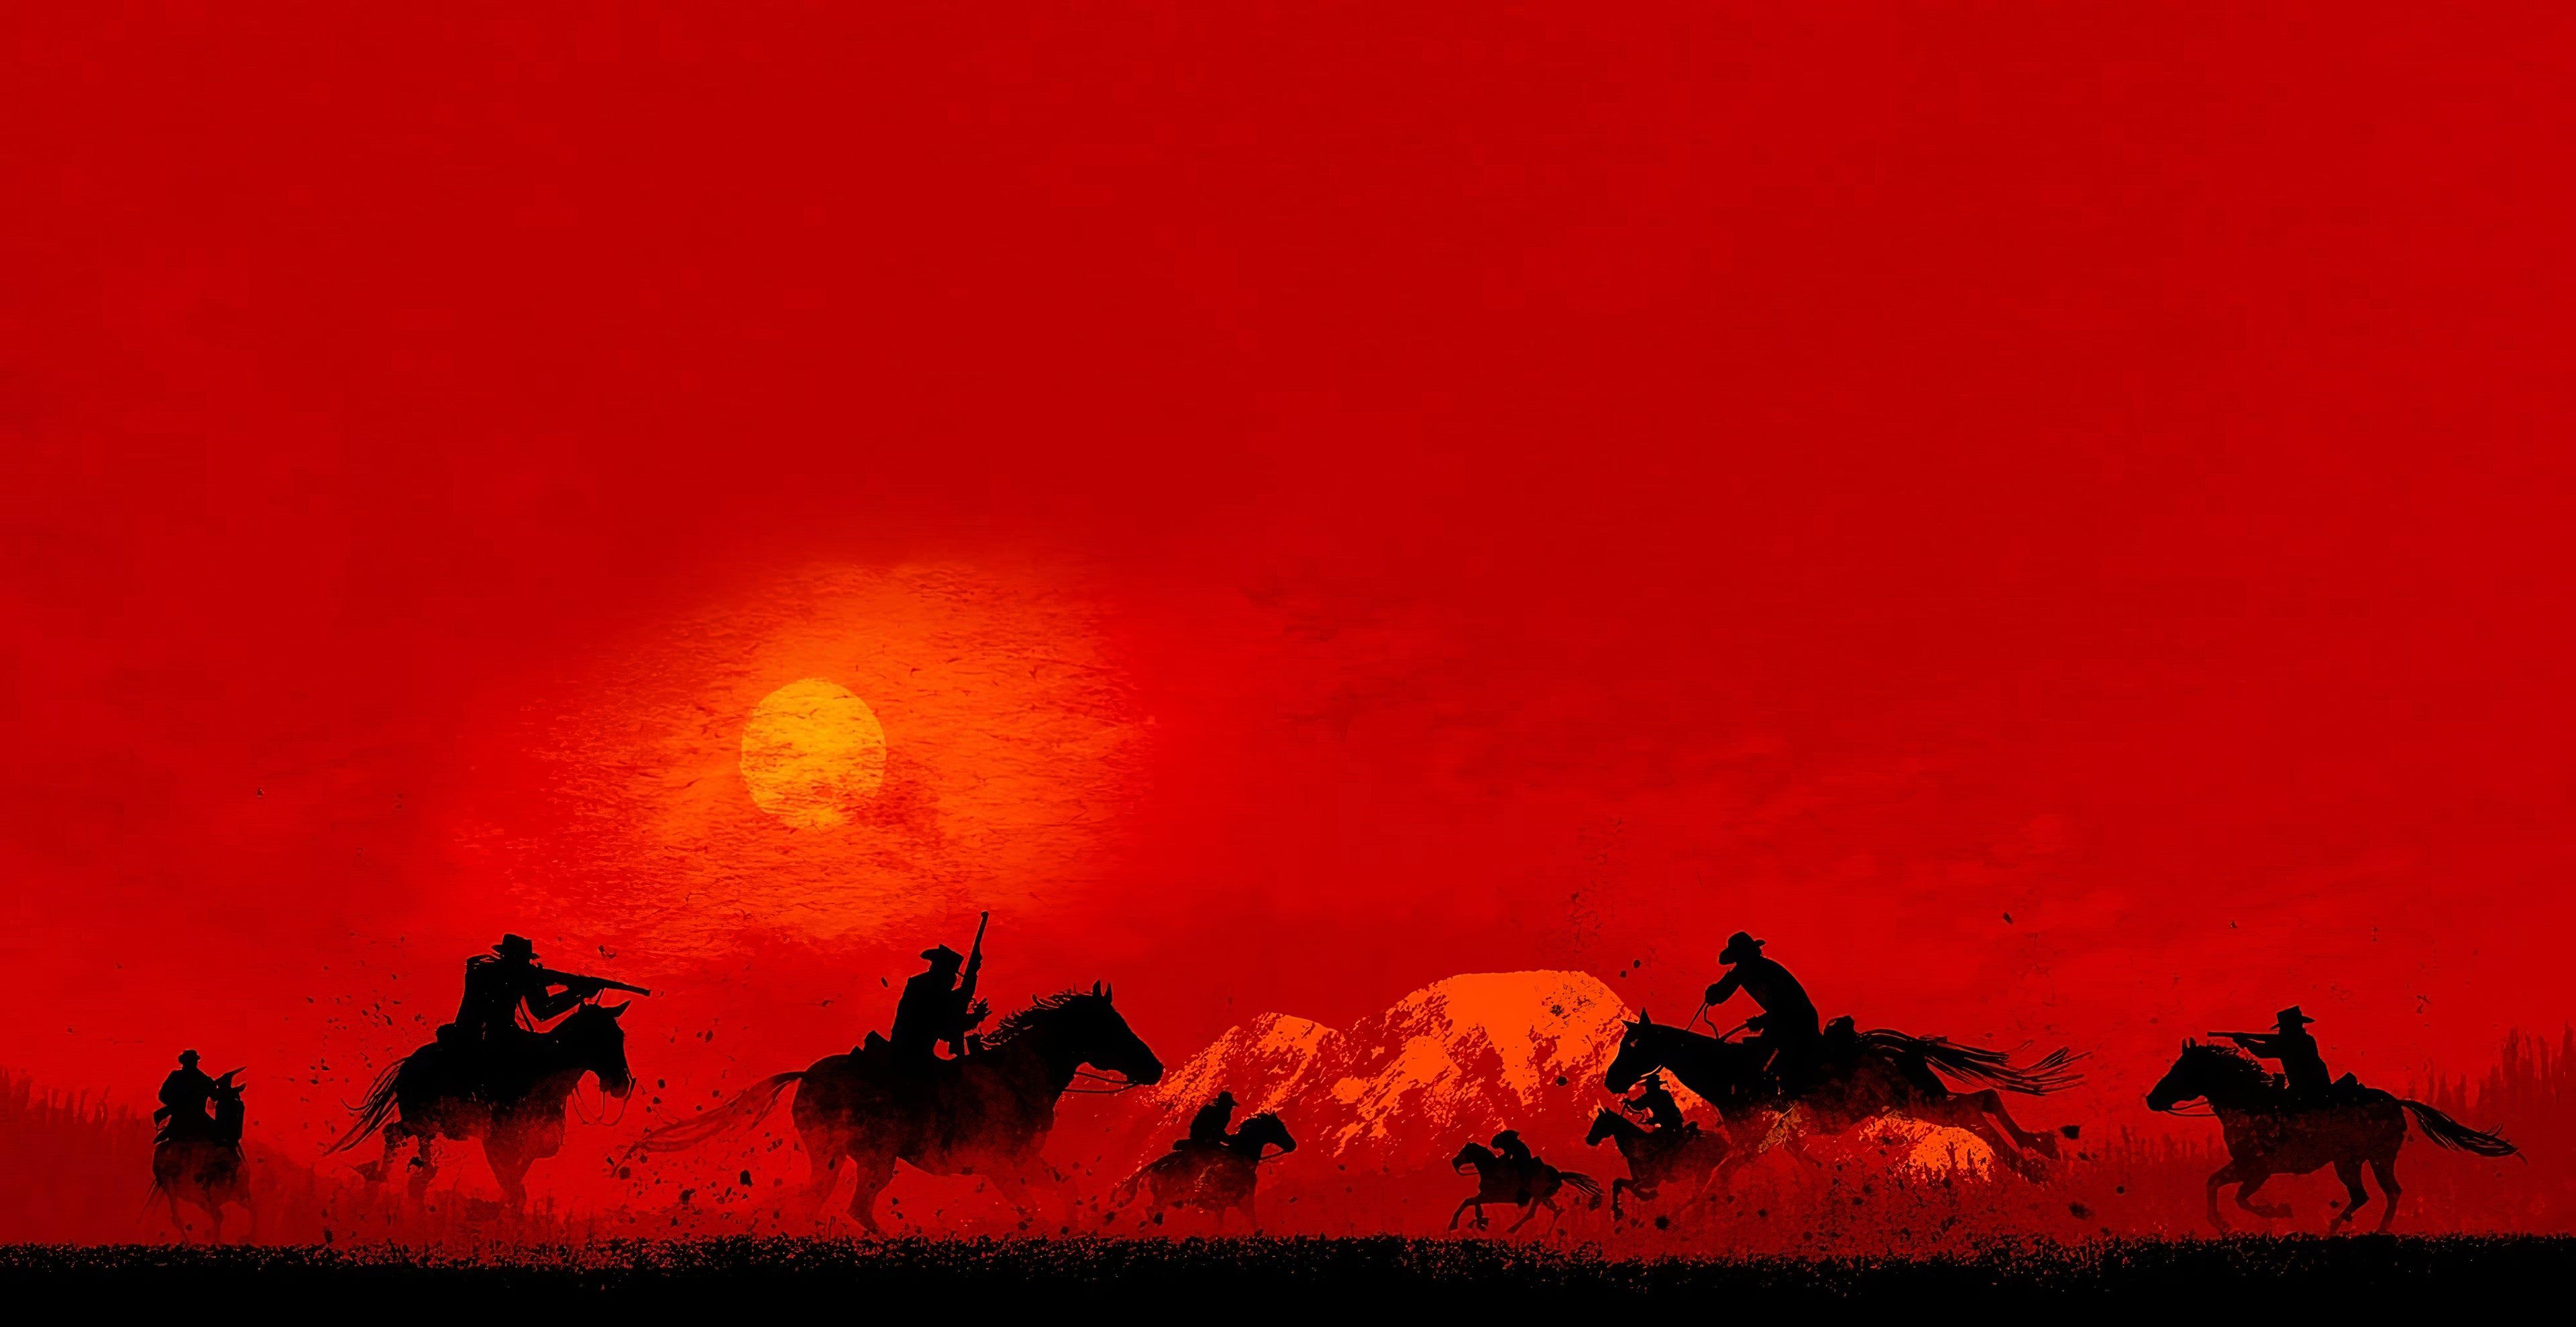 Red Dead Redemption 2 Wallpaper Red Dead Online Red Dead